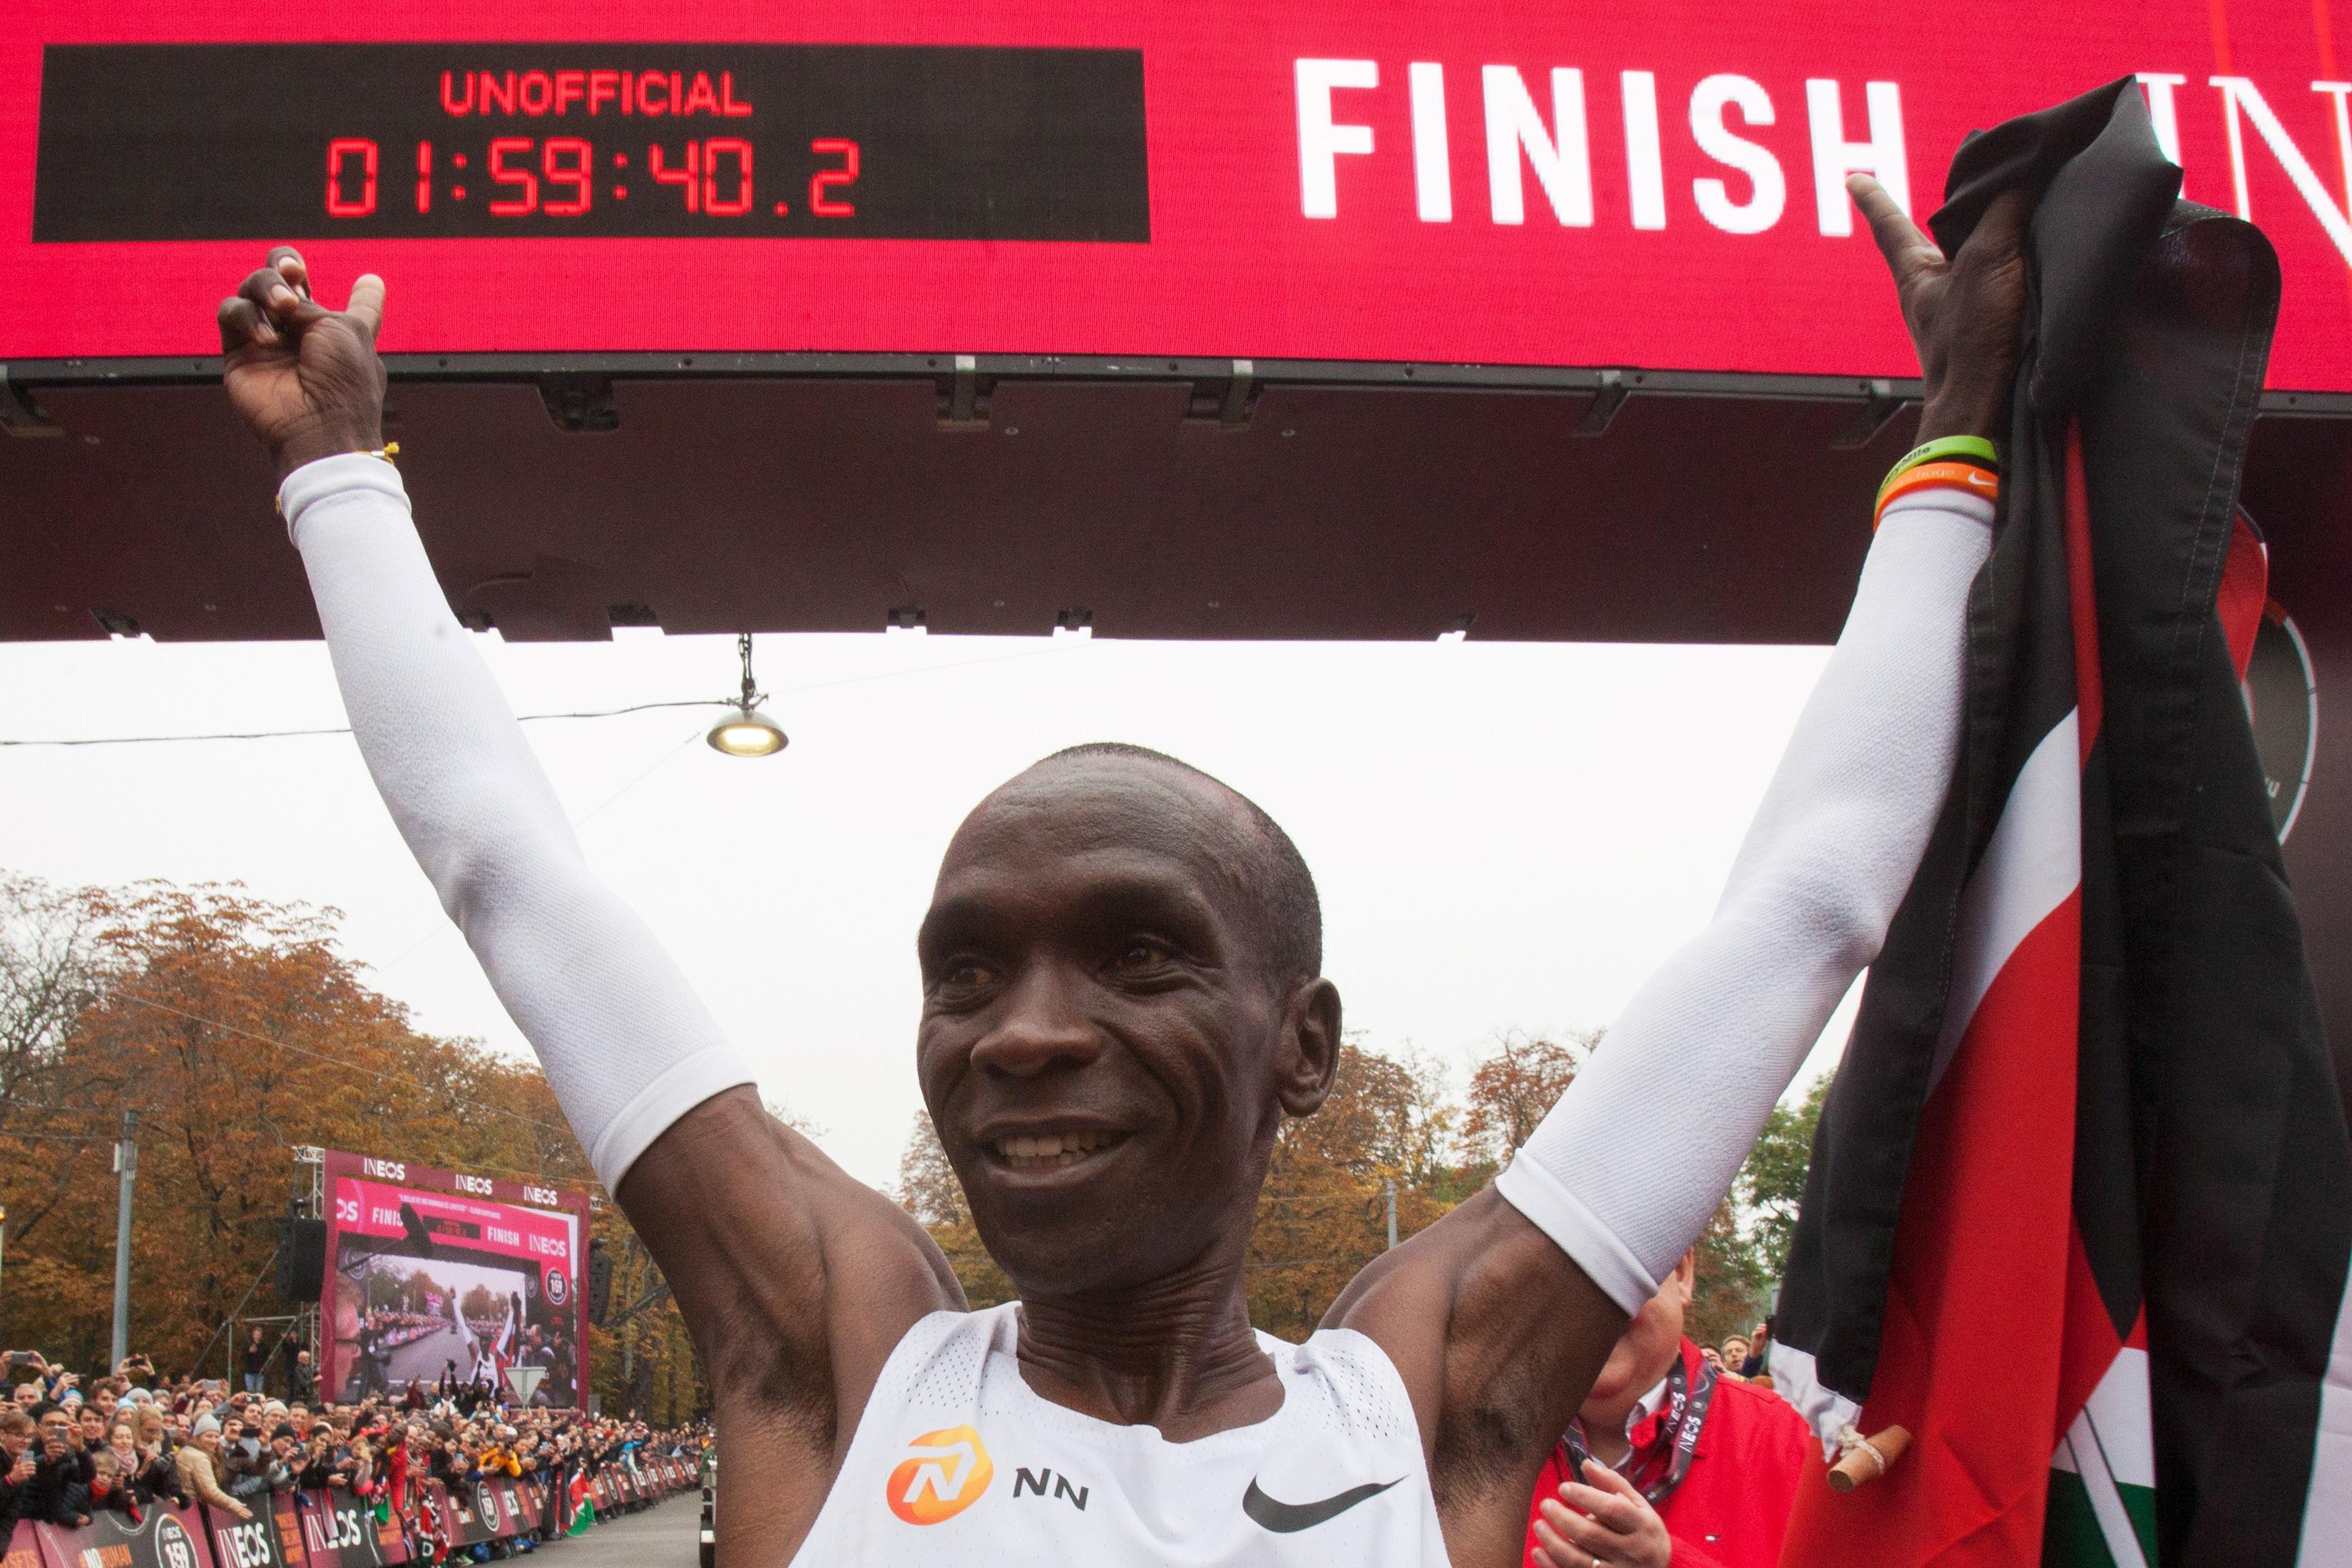 Eliud Kipchoge, Kenya, Marathon, two-hour mark in marathon,